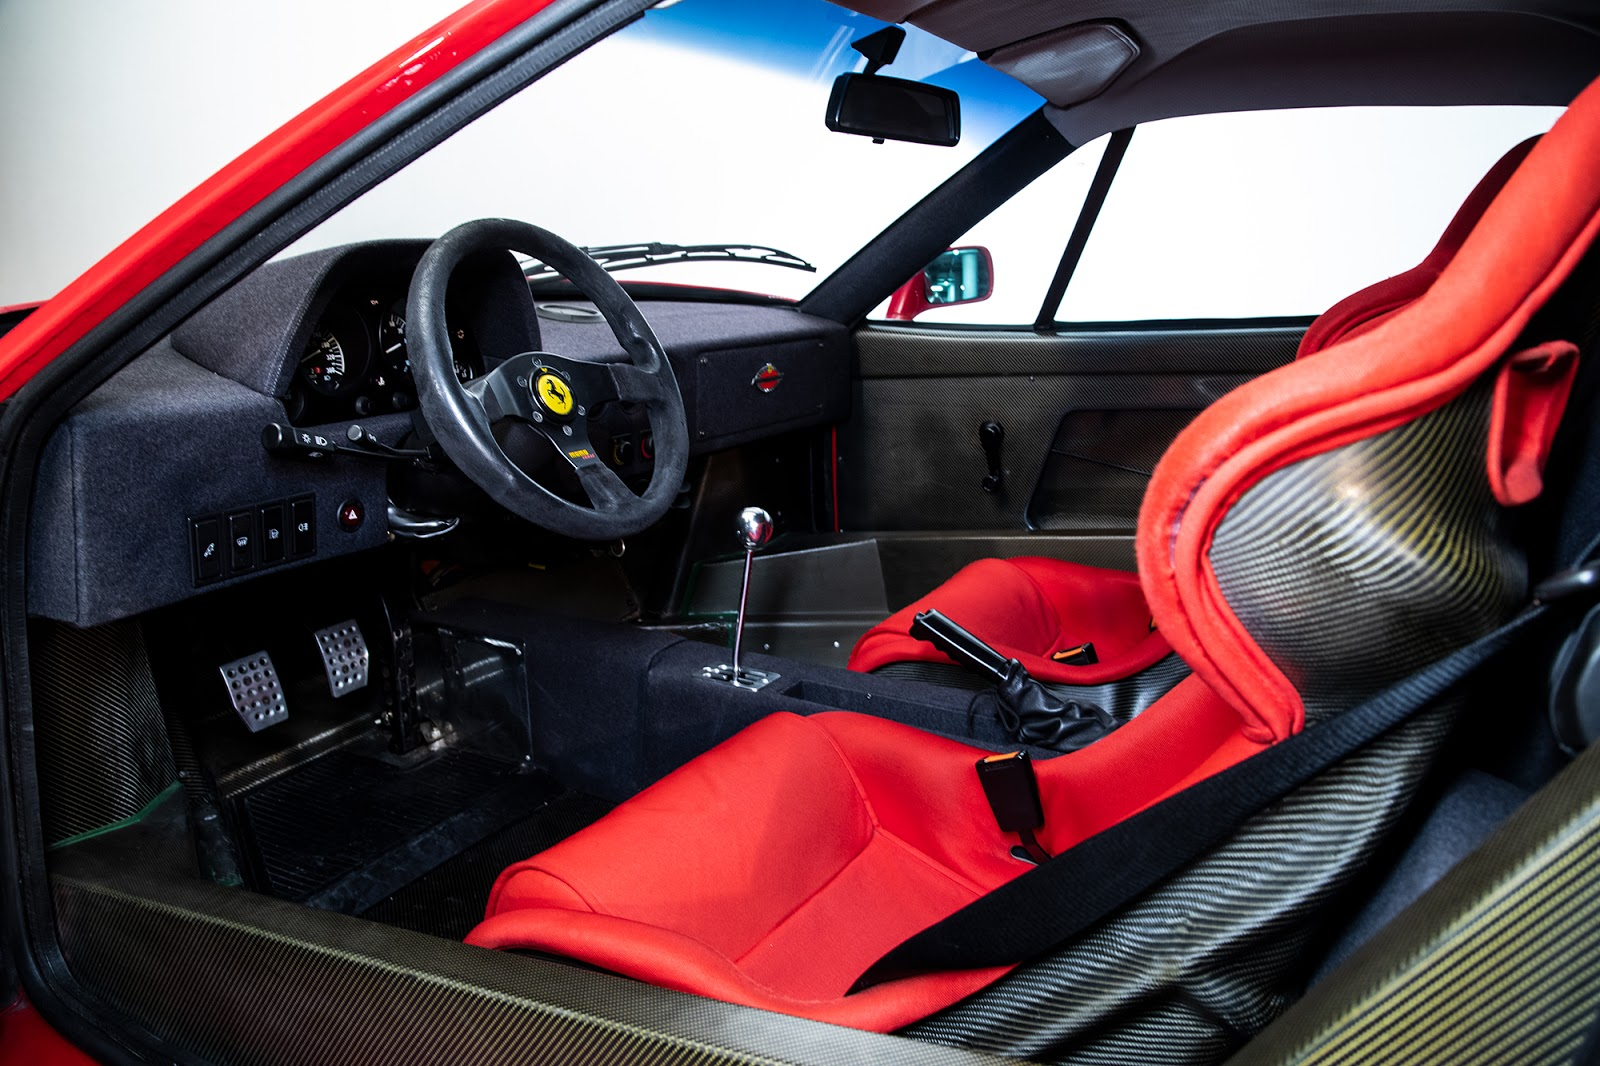 MK5 4934 F40. O μύθος, ο θρύλος F40, Ferrari, Ferrari F40, retrocar, retrocar sunday, zblog